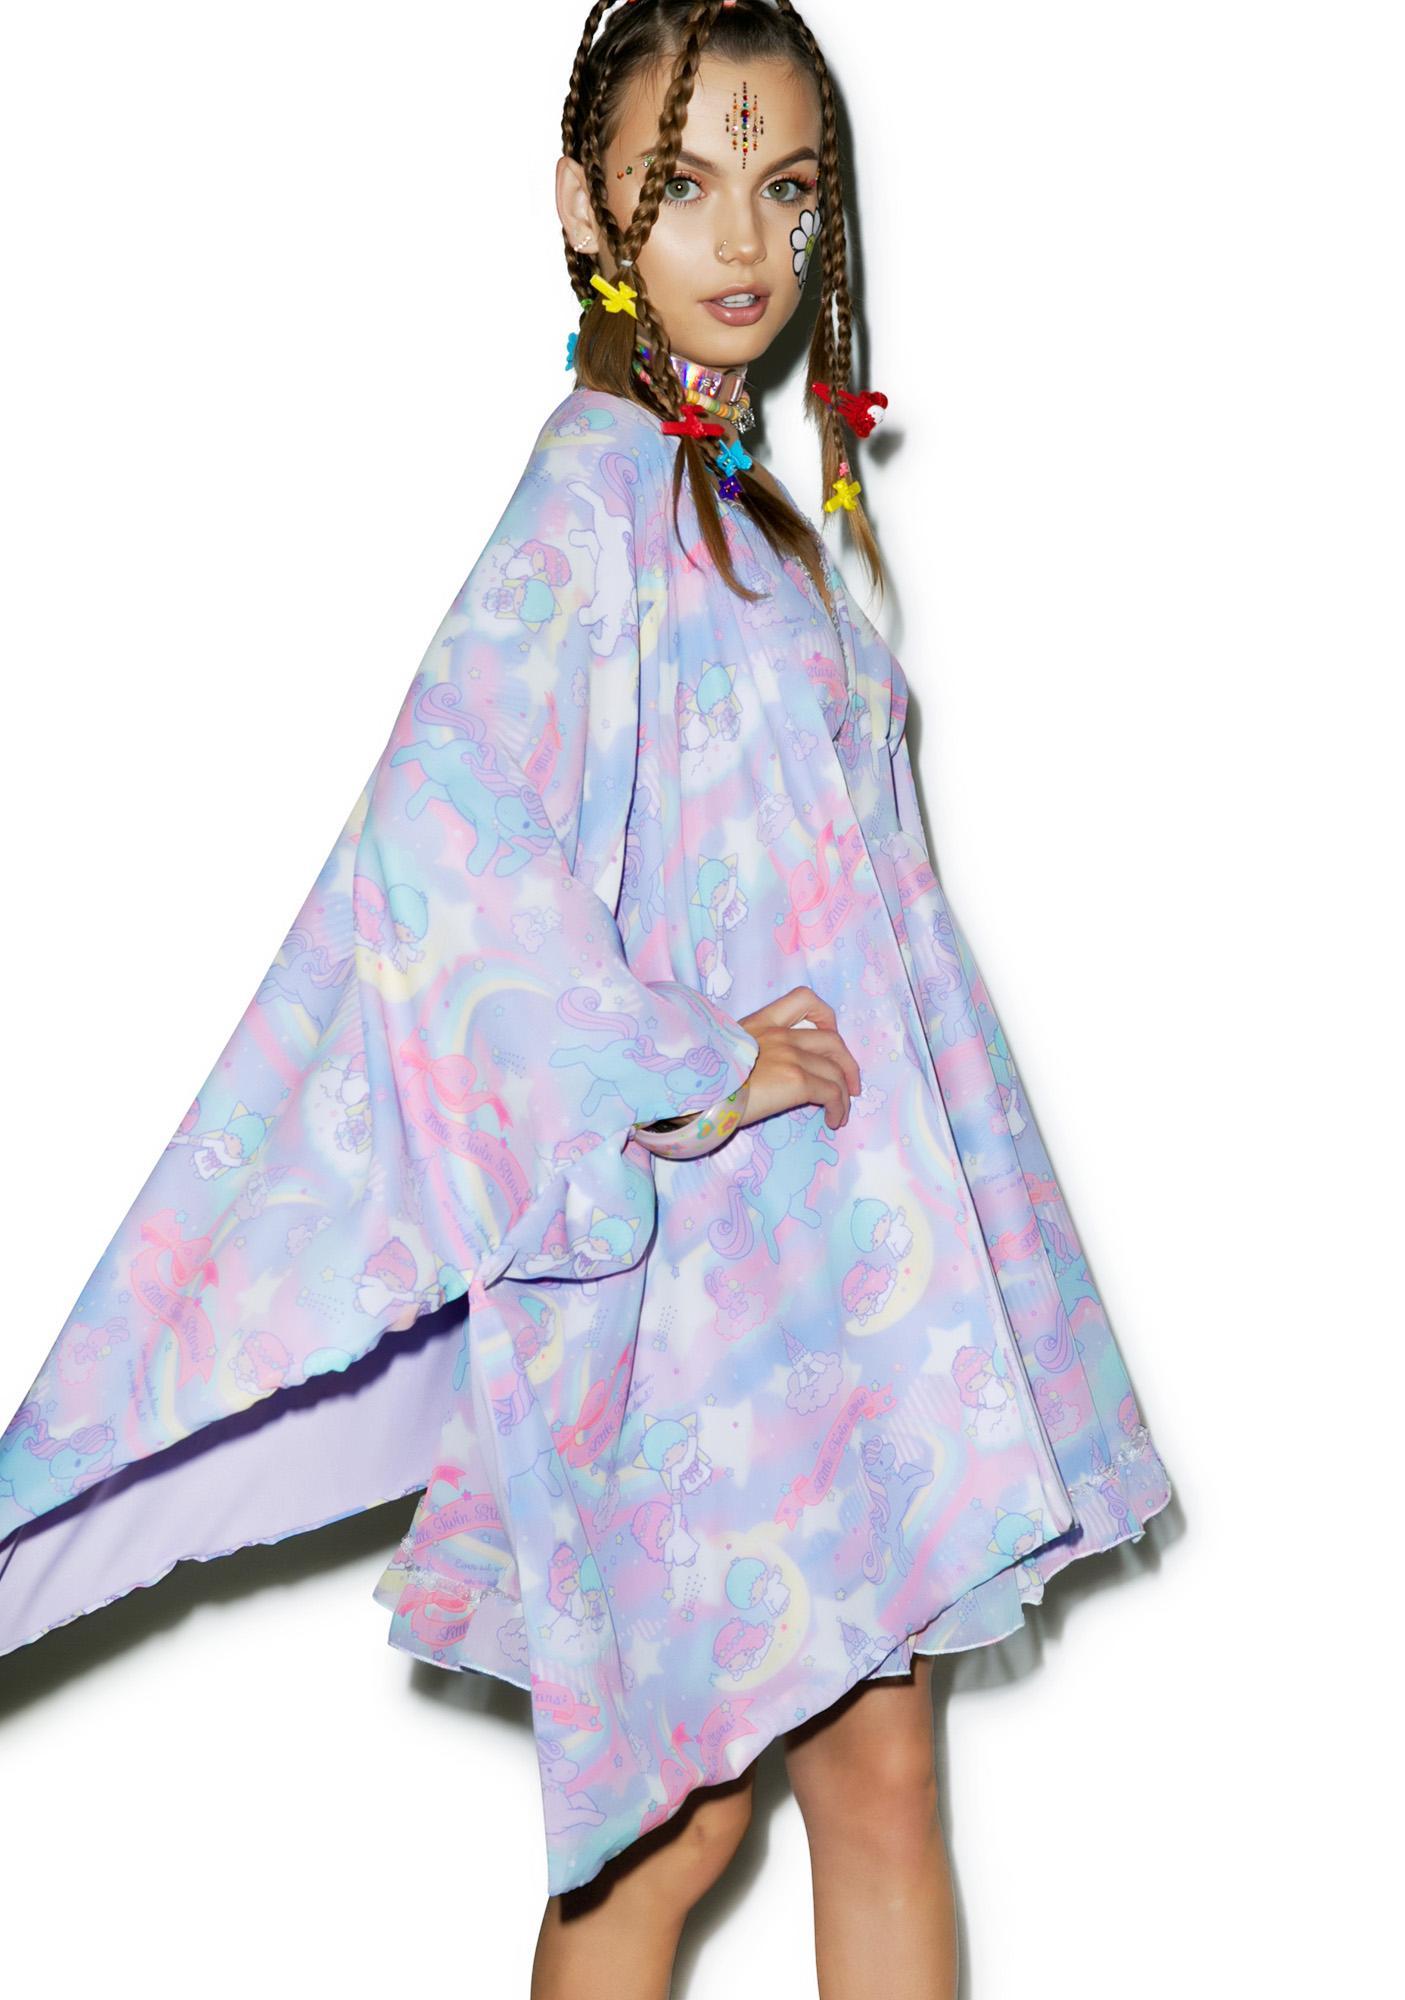 Japan L.A. Little Twin Stars Dreamy Unicorn Kimono